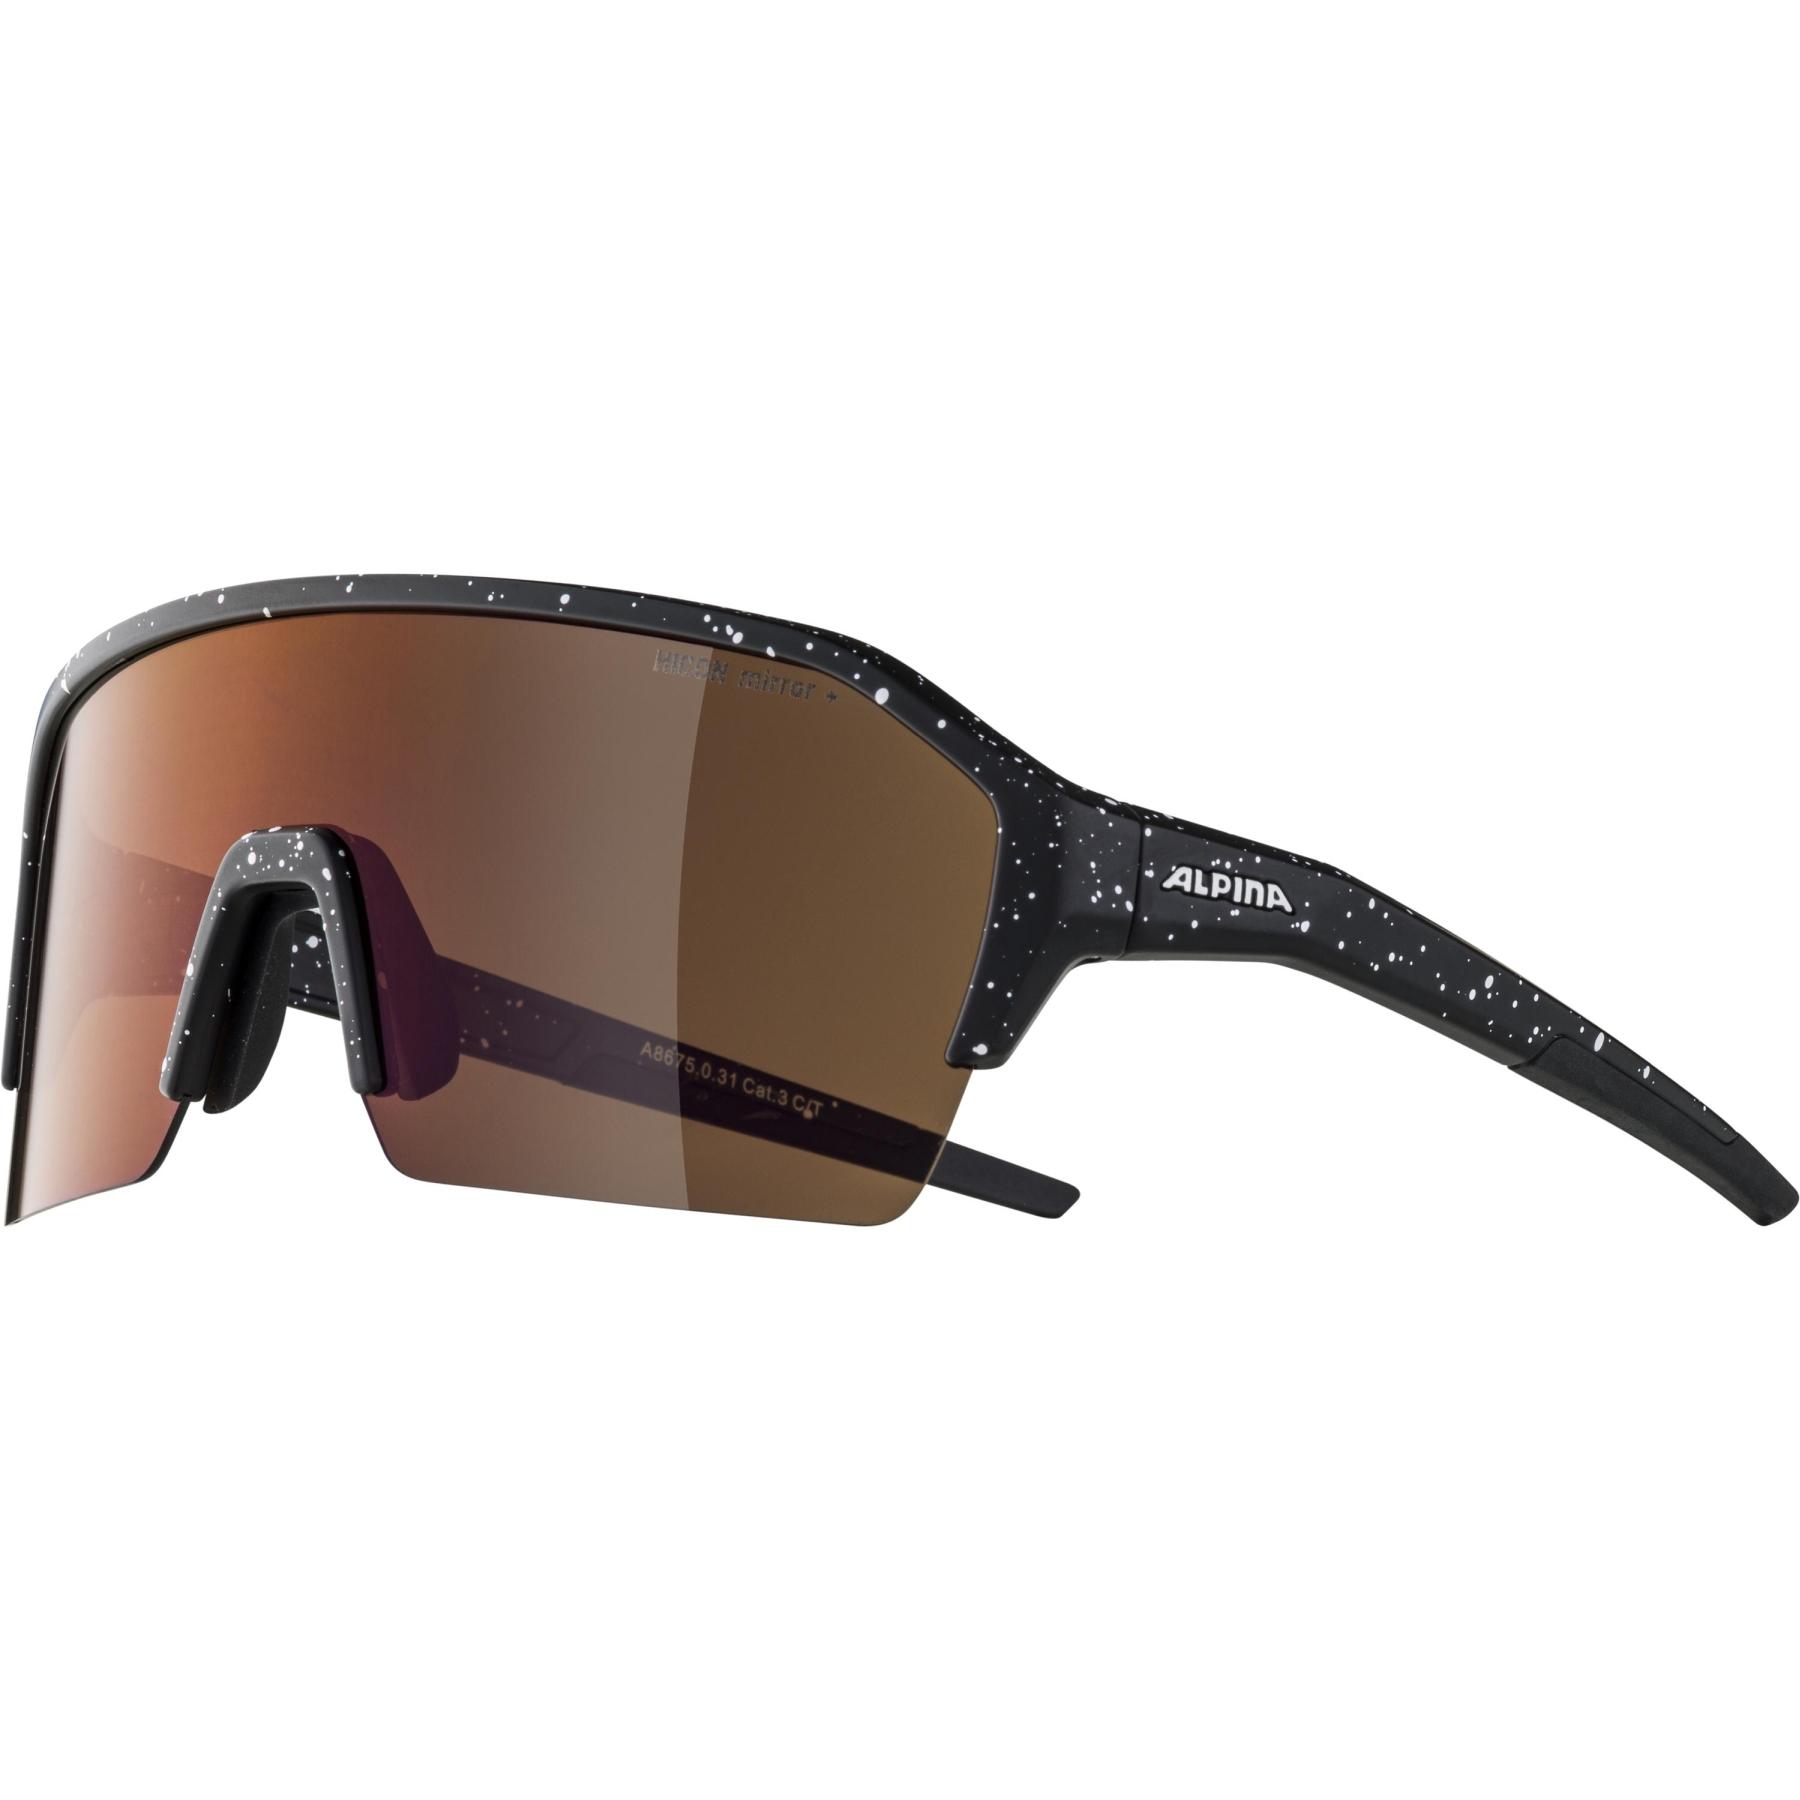 Image of Alpina Ram HR HM+ Glasses - black blur matt / Hicon red mirror